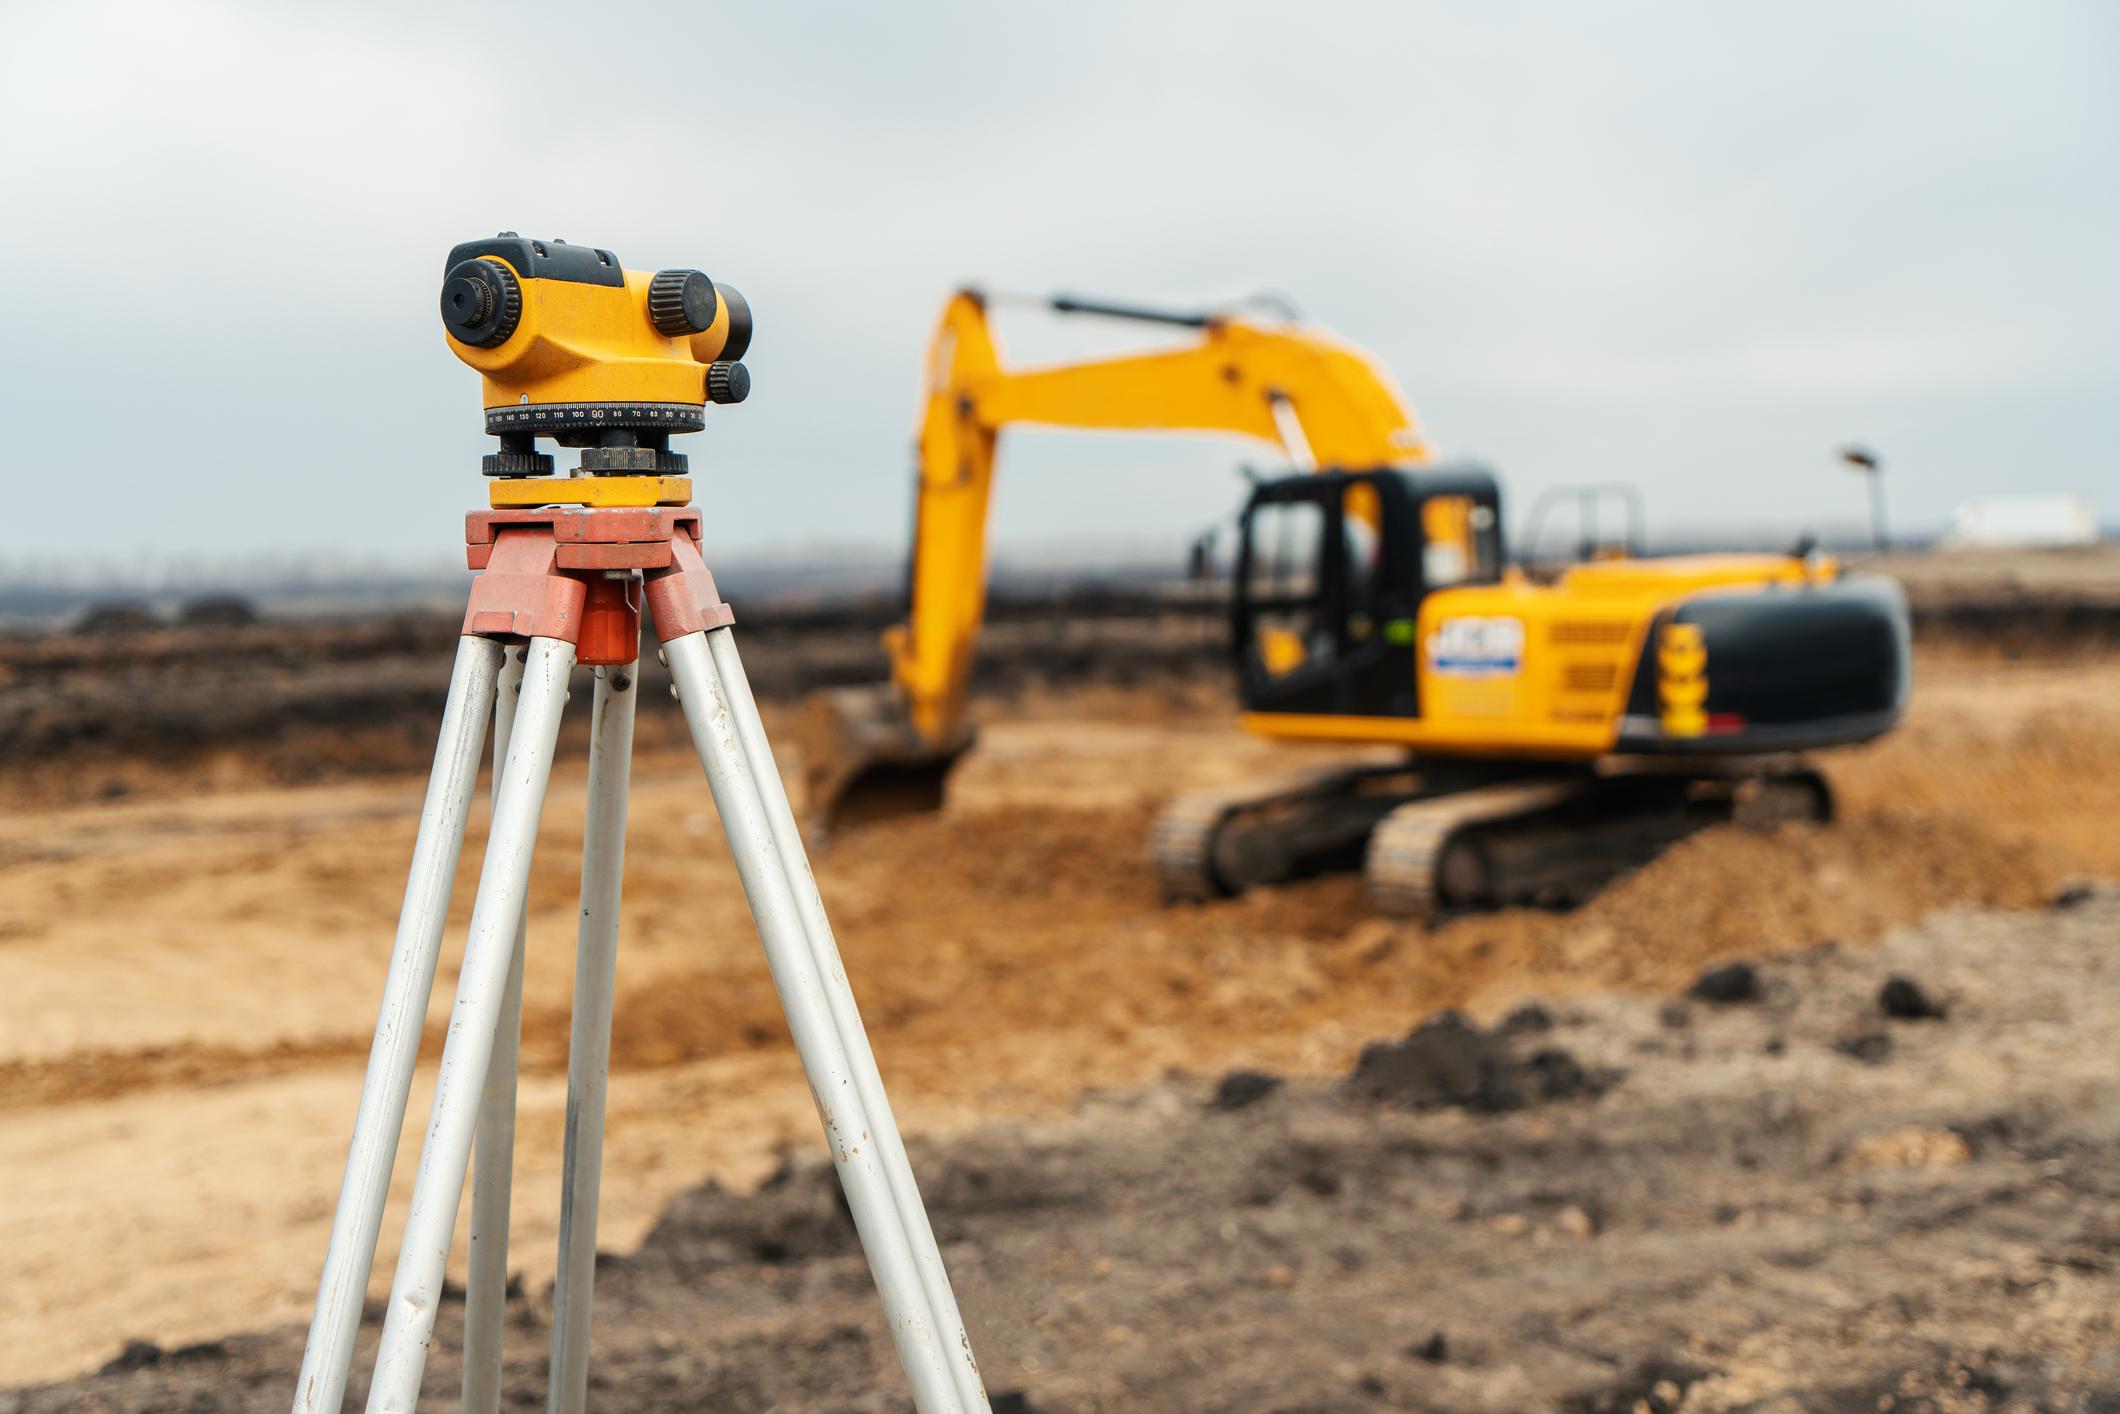 Project Surveyor